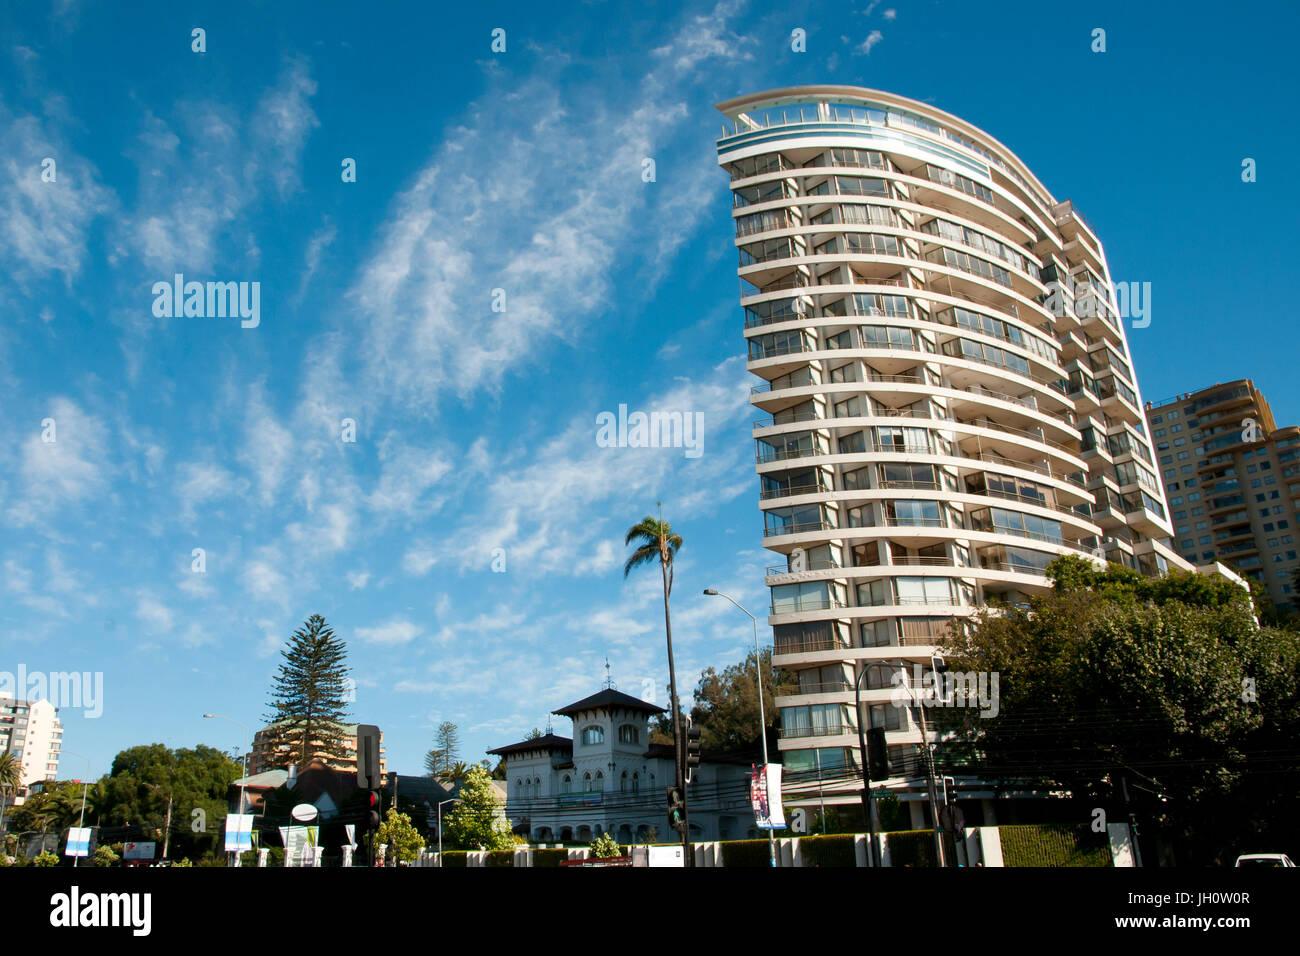 Residential Building in Vina Del Mar - Chile - Stock Image